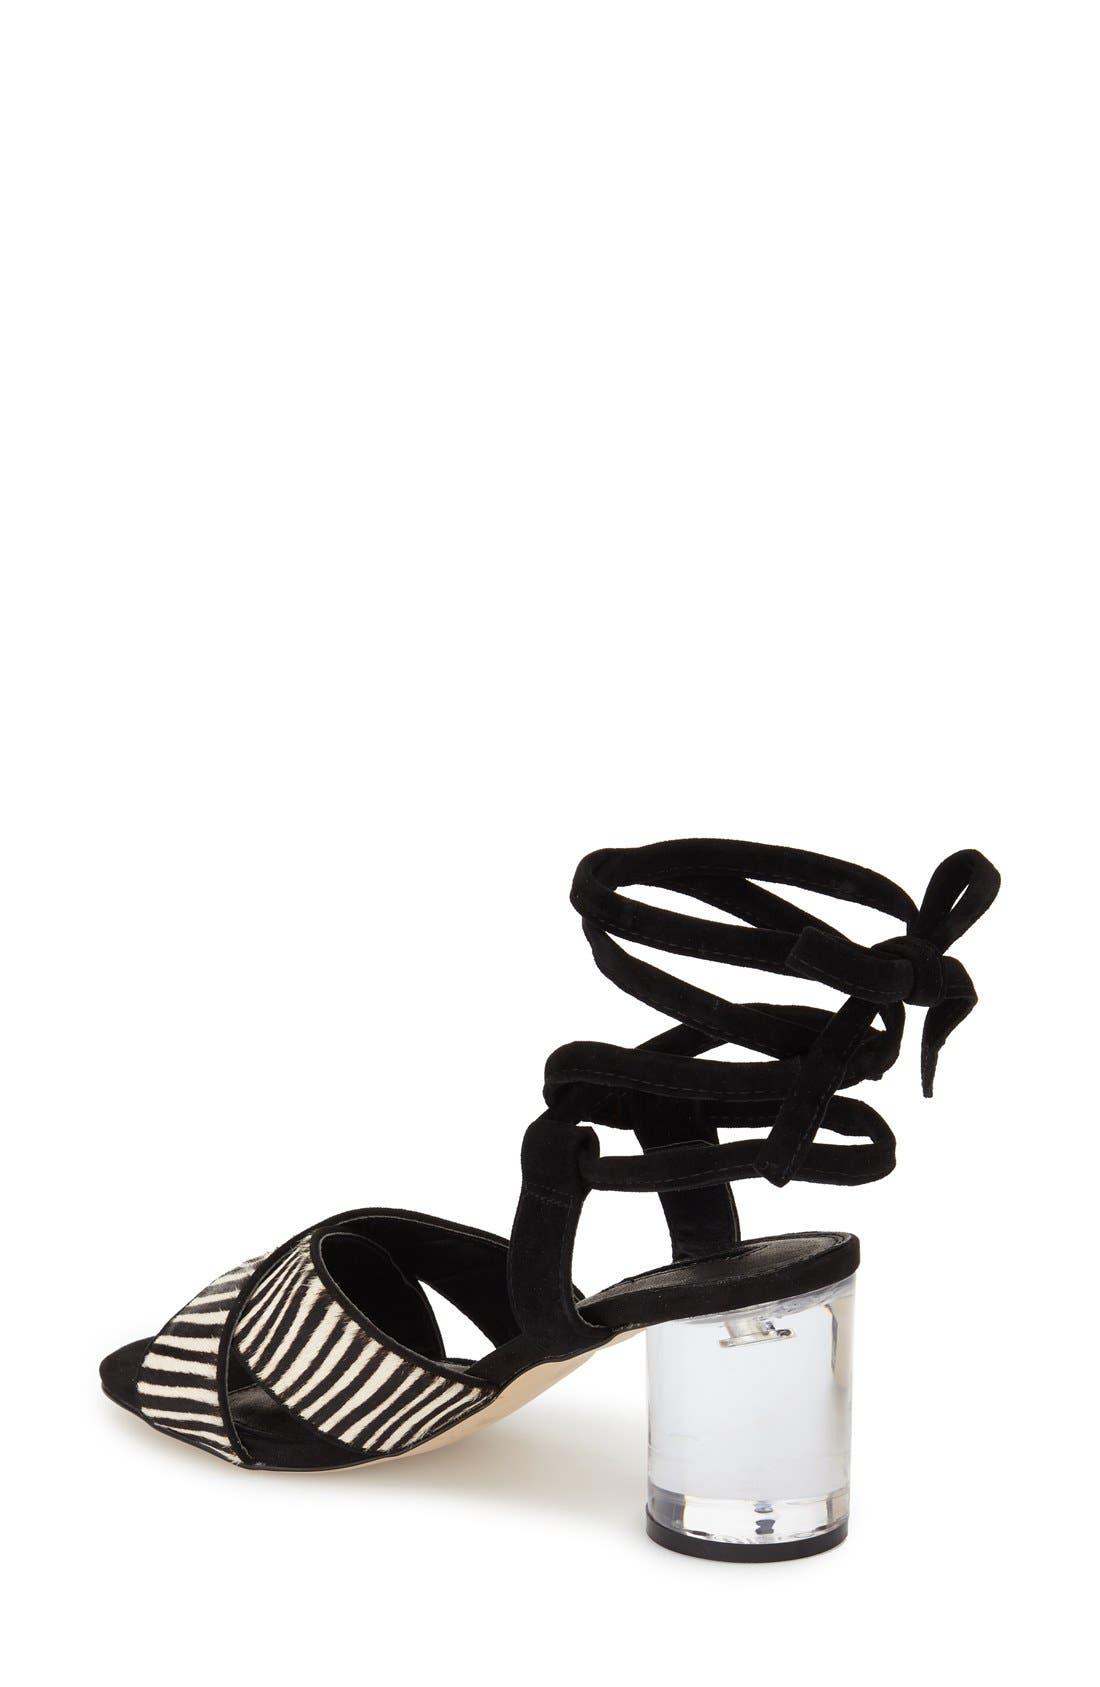 TOPSHOP,                             'Raffle' Ankle Strap Sandal,                             Alternate thumbnail 2, color,                             001